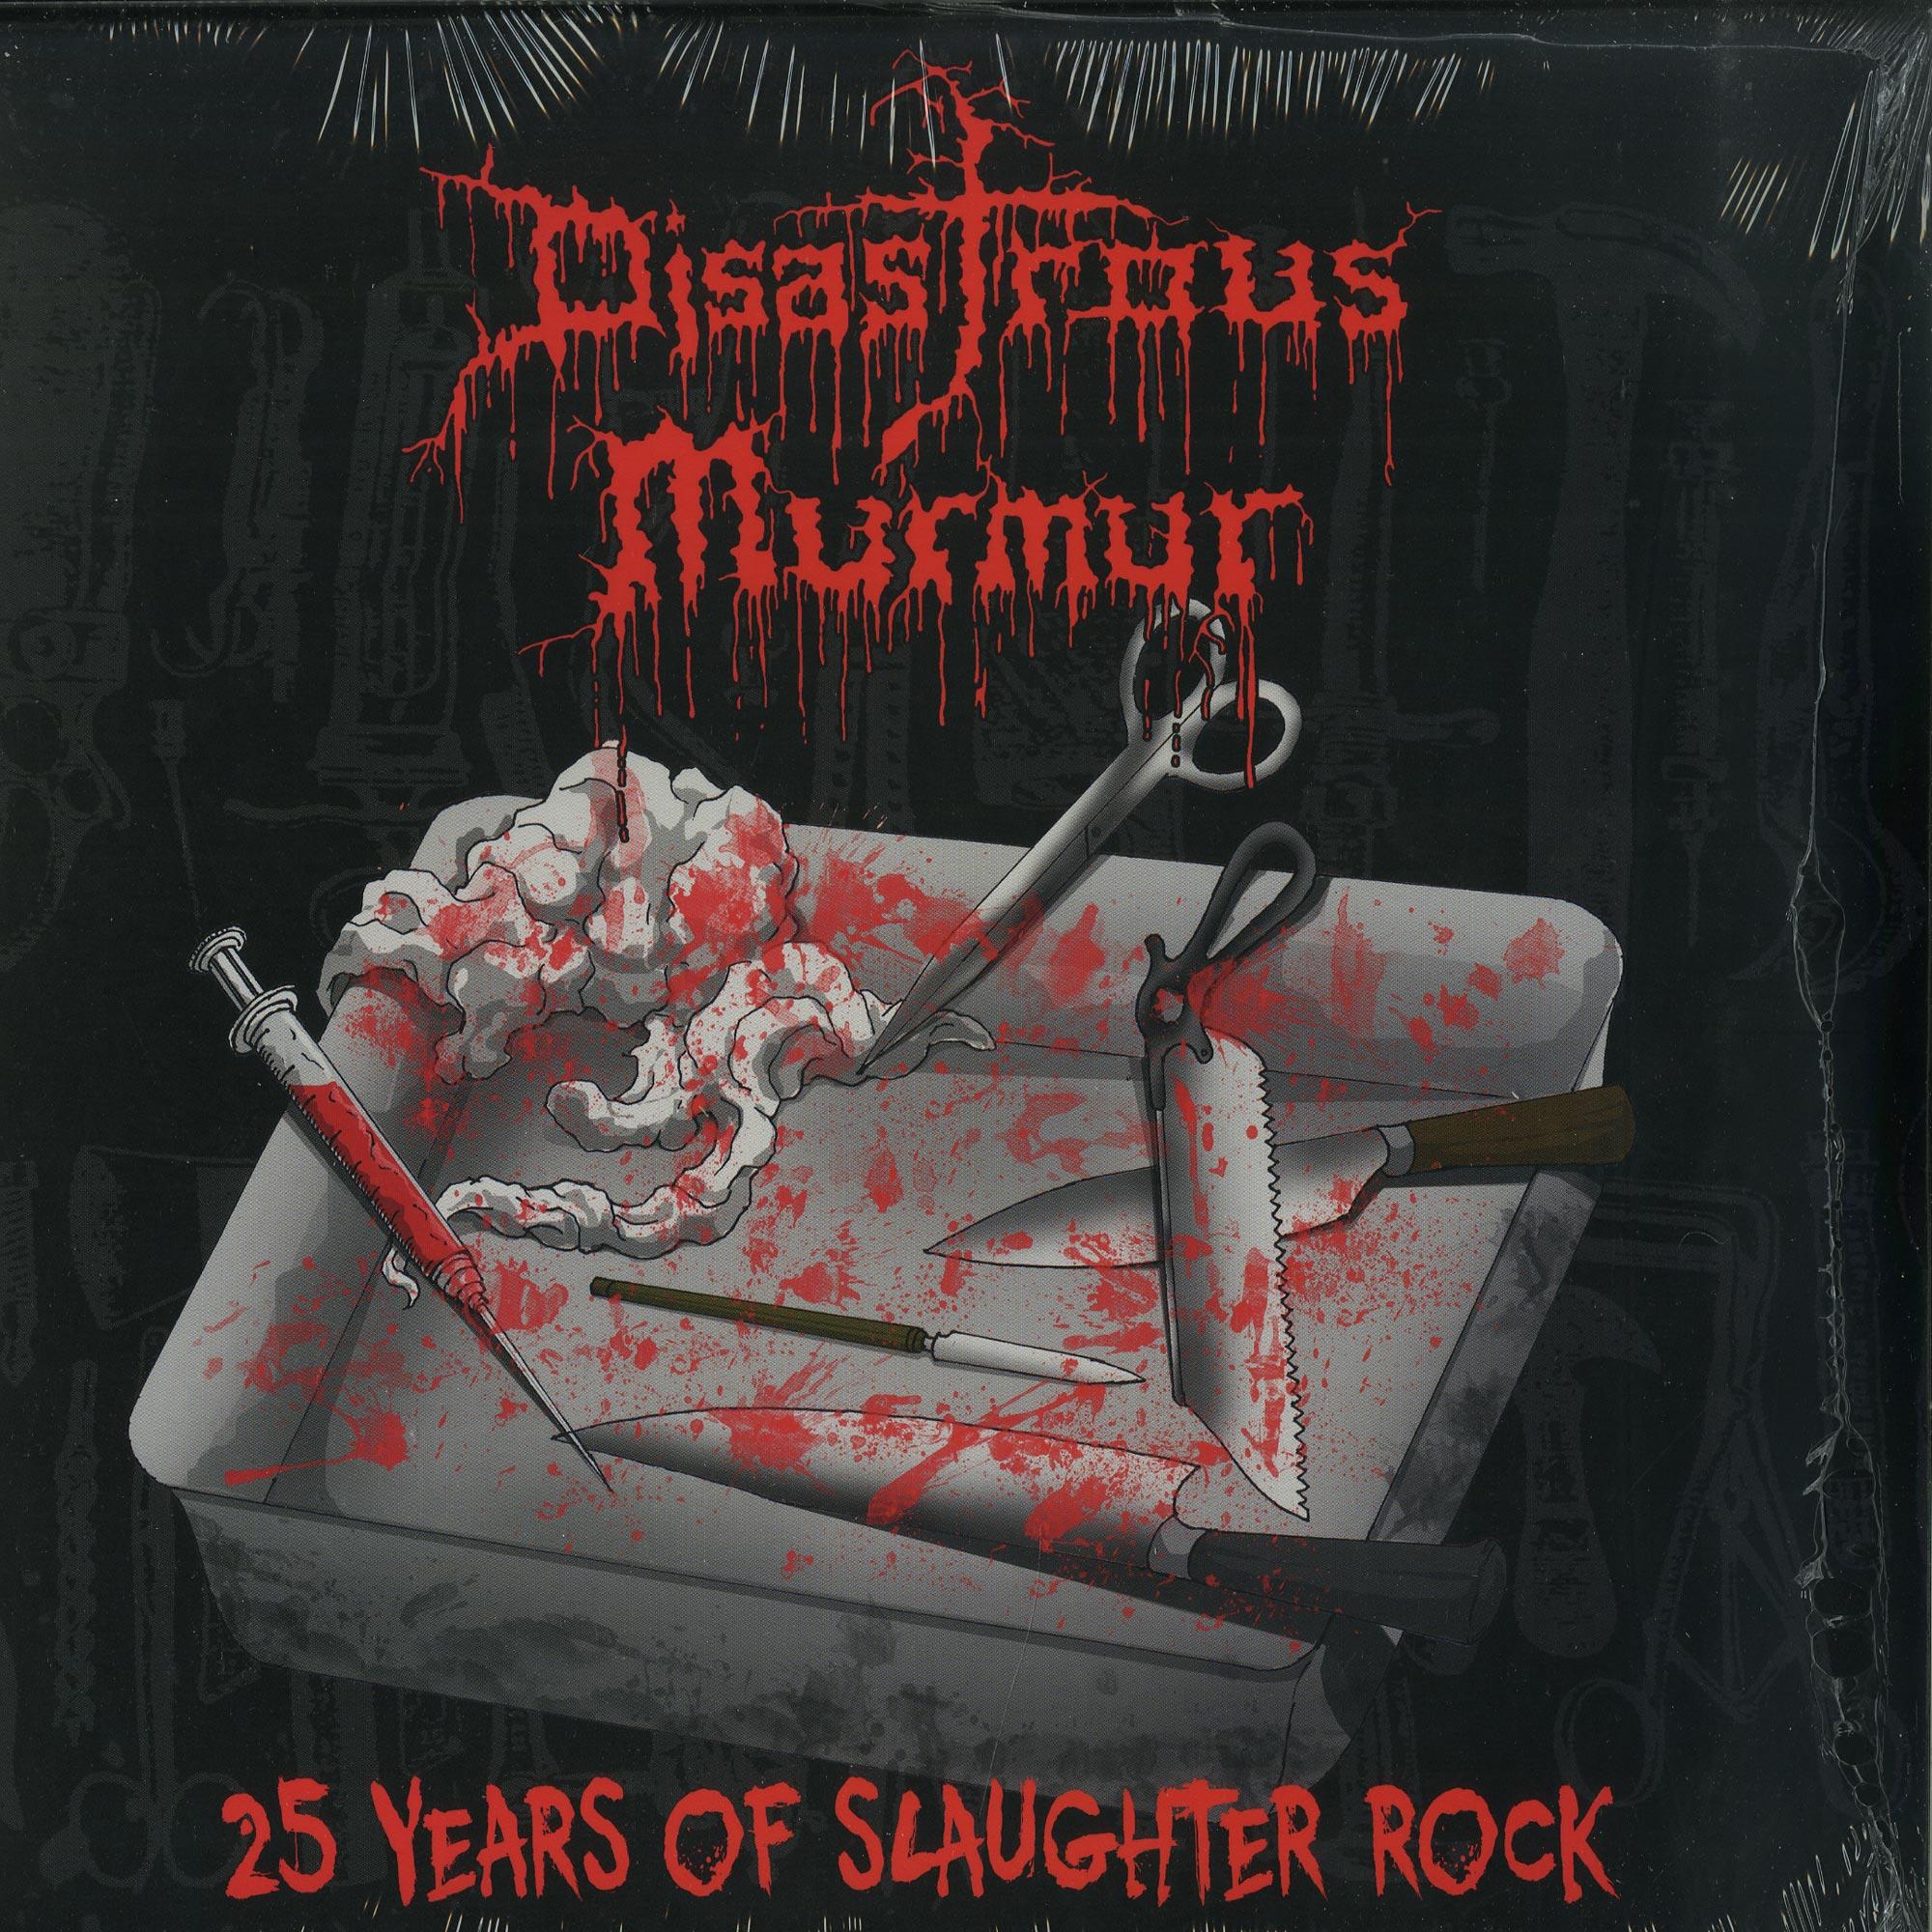 Disastrus Murmur - 25 YEARS OF SLAGHTER ROCK